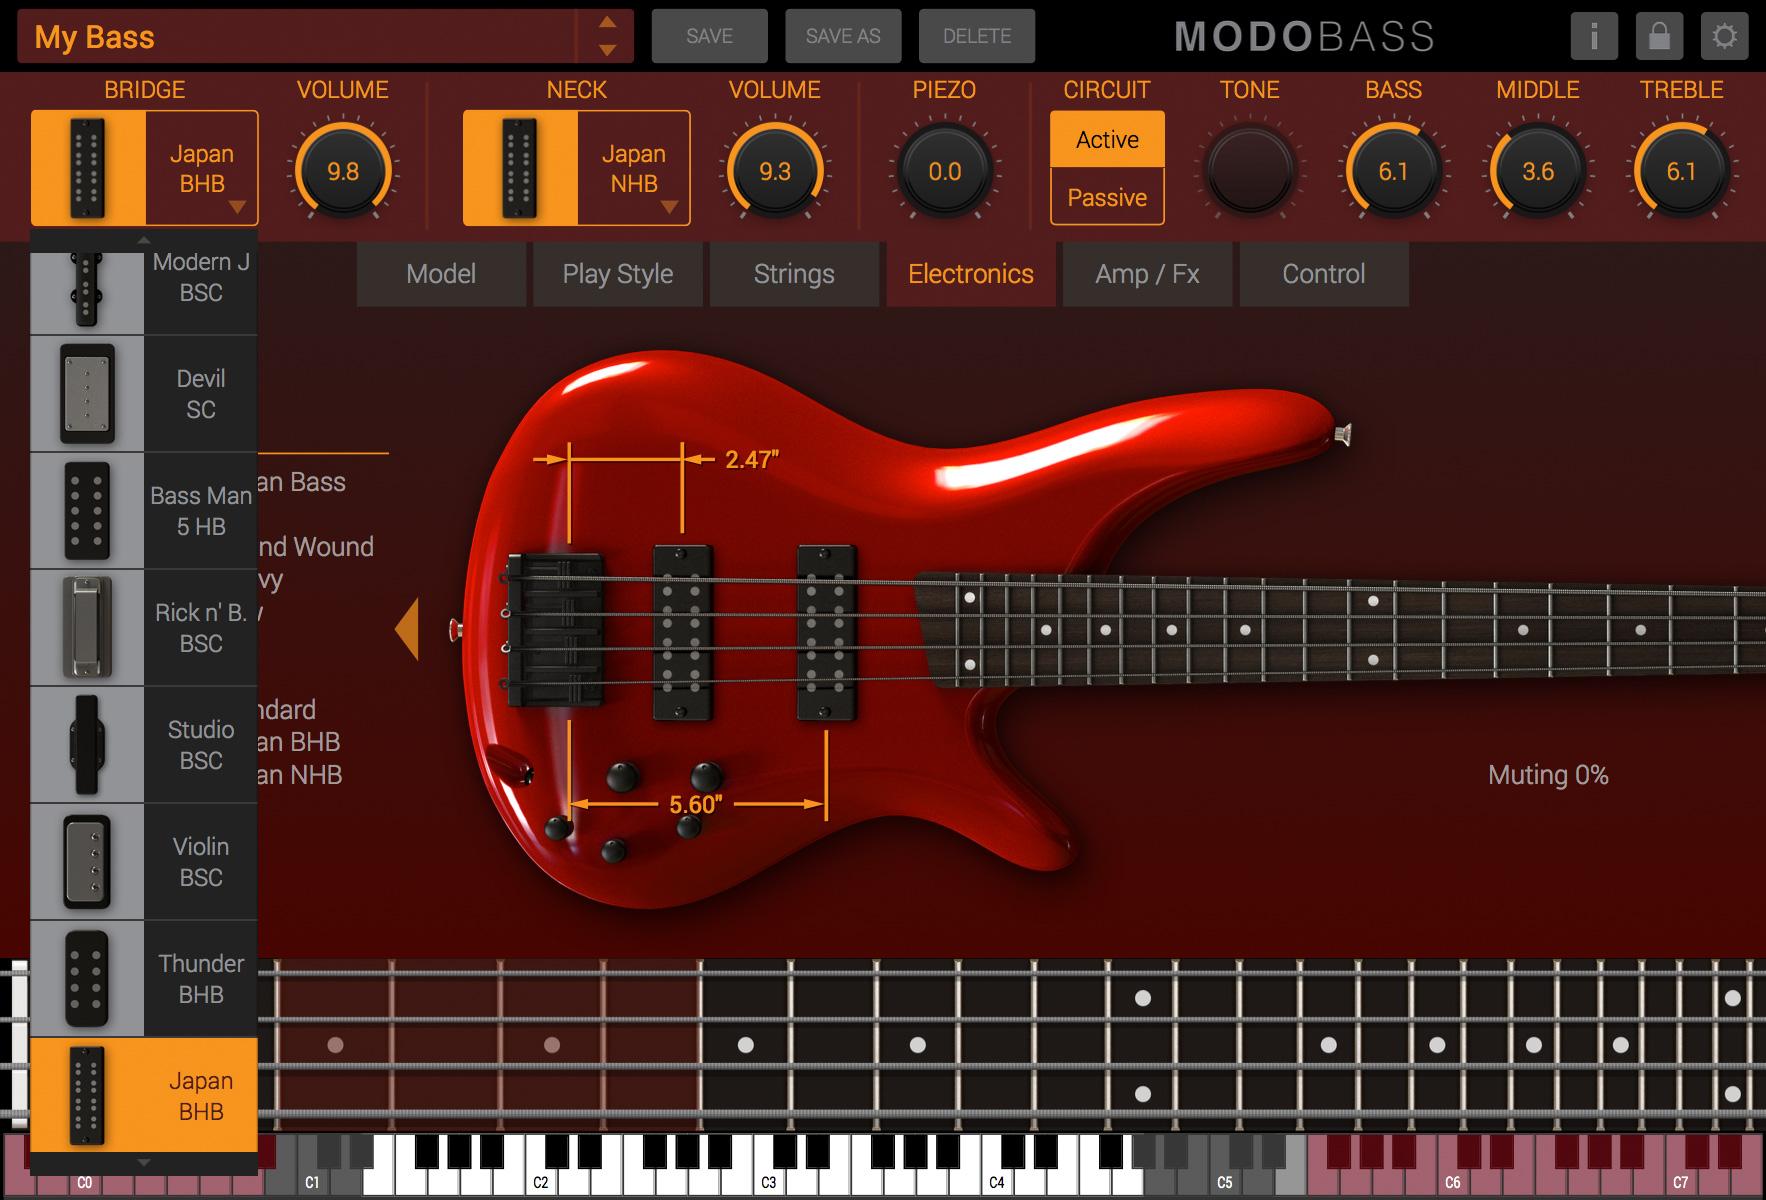 kvr modo bass by ik multimedia virtual bass guitar vst plugin audio units plugin vst 3. Black Bedroom Furniture Sets. Home Design Ideas